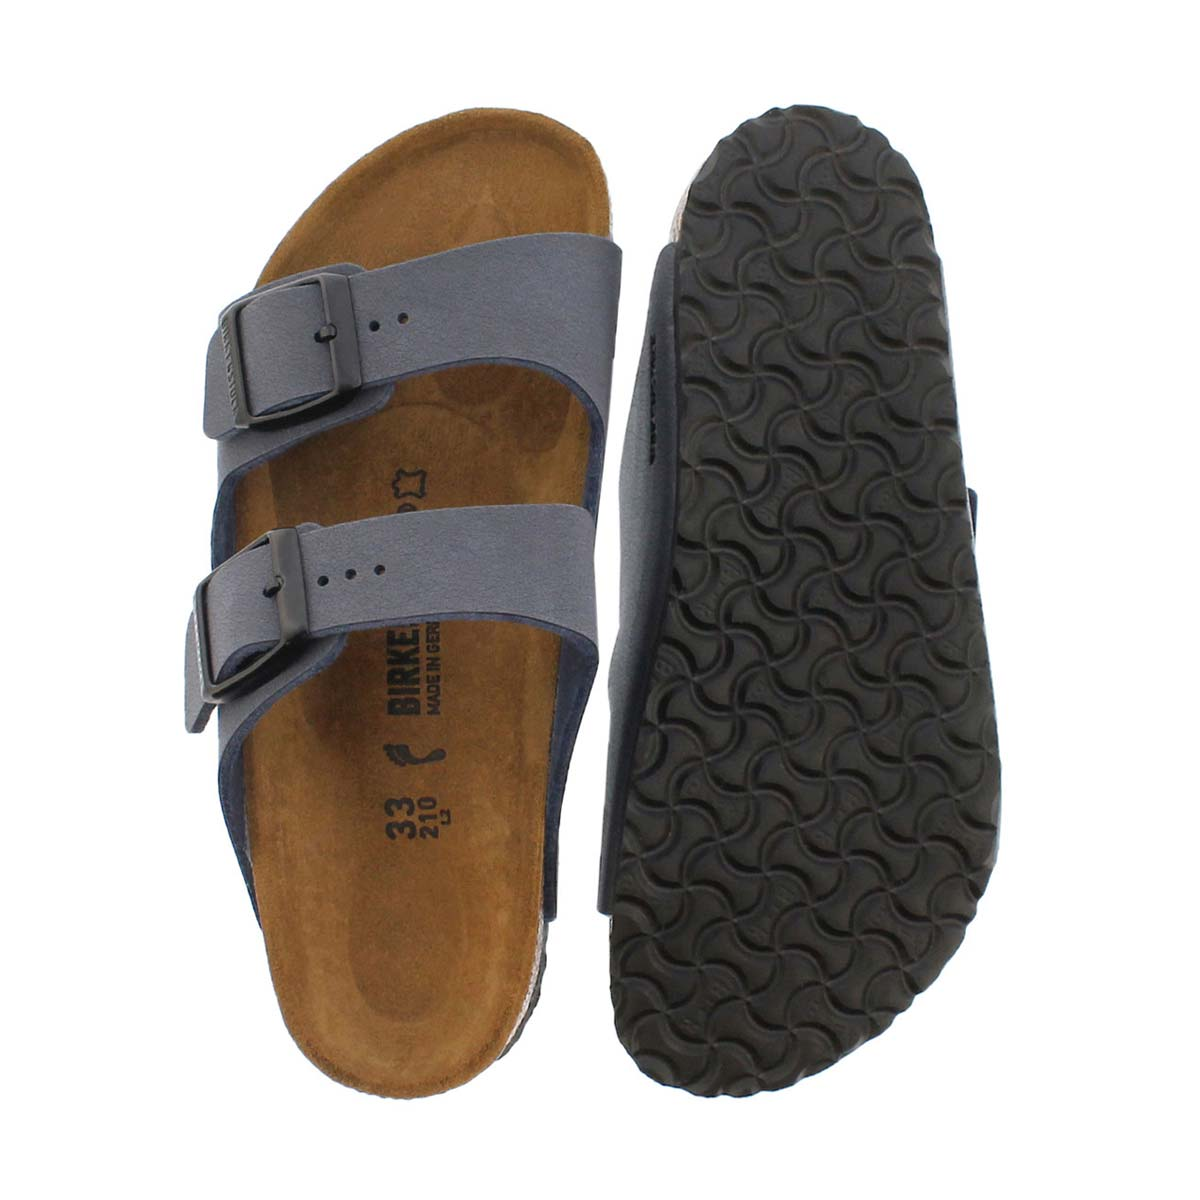 Kds Arizona navy BF 2 strap sandal-N